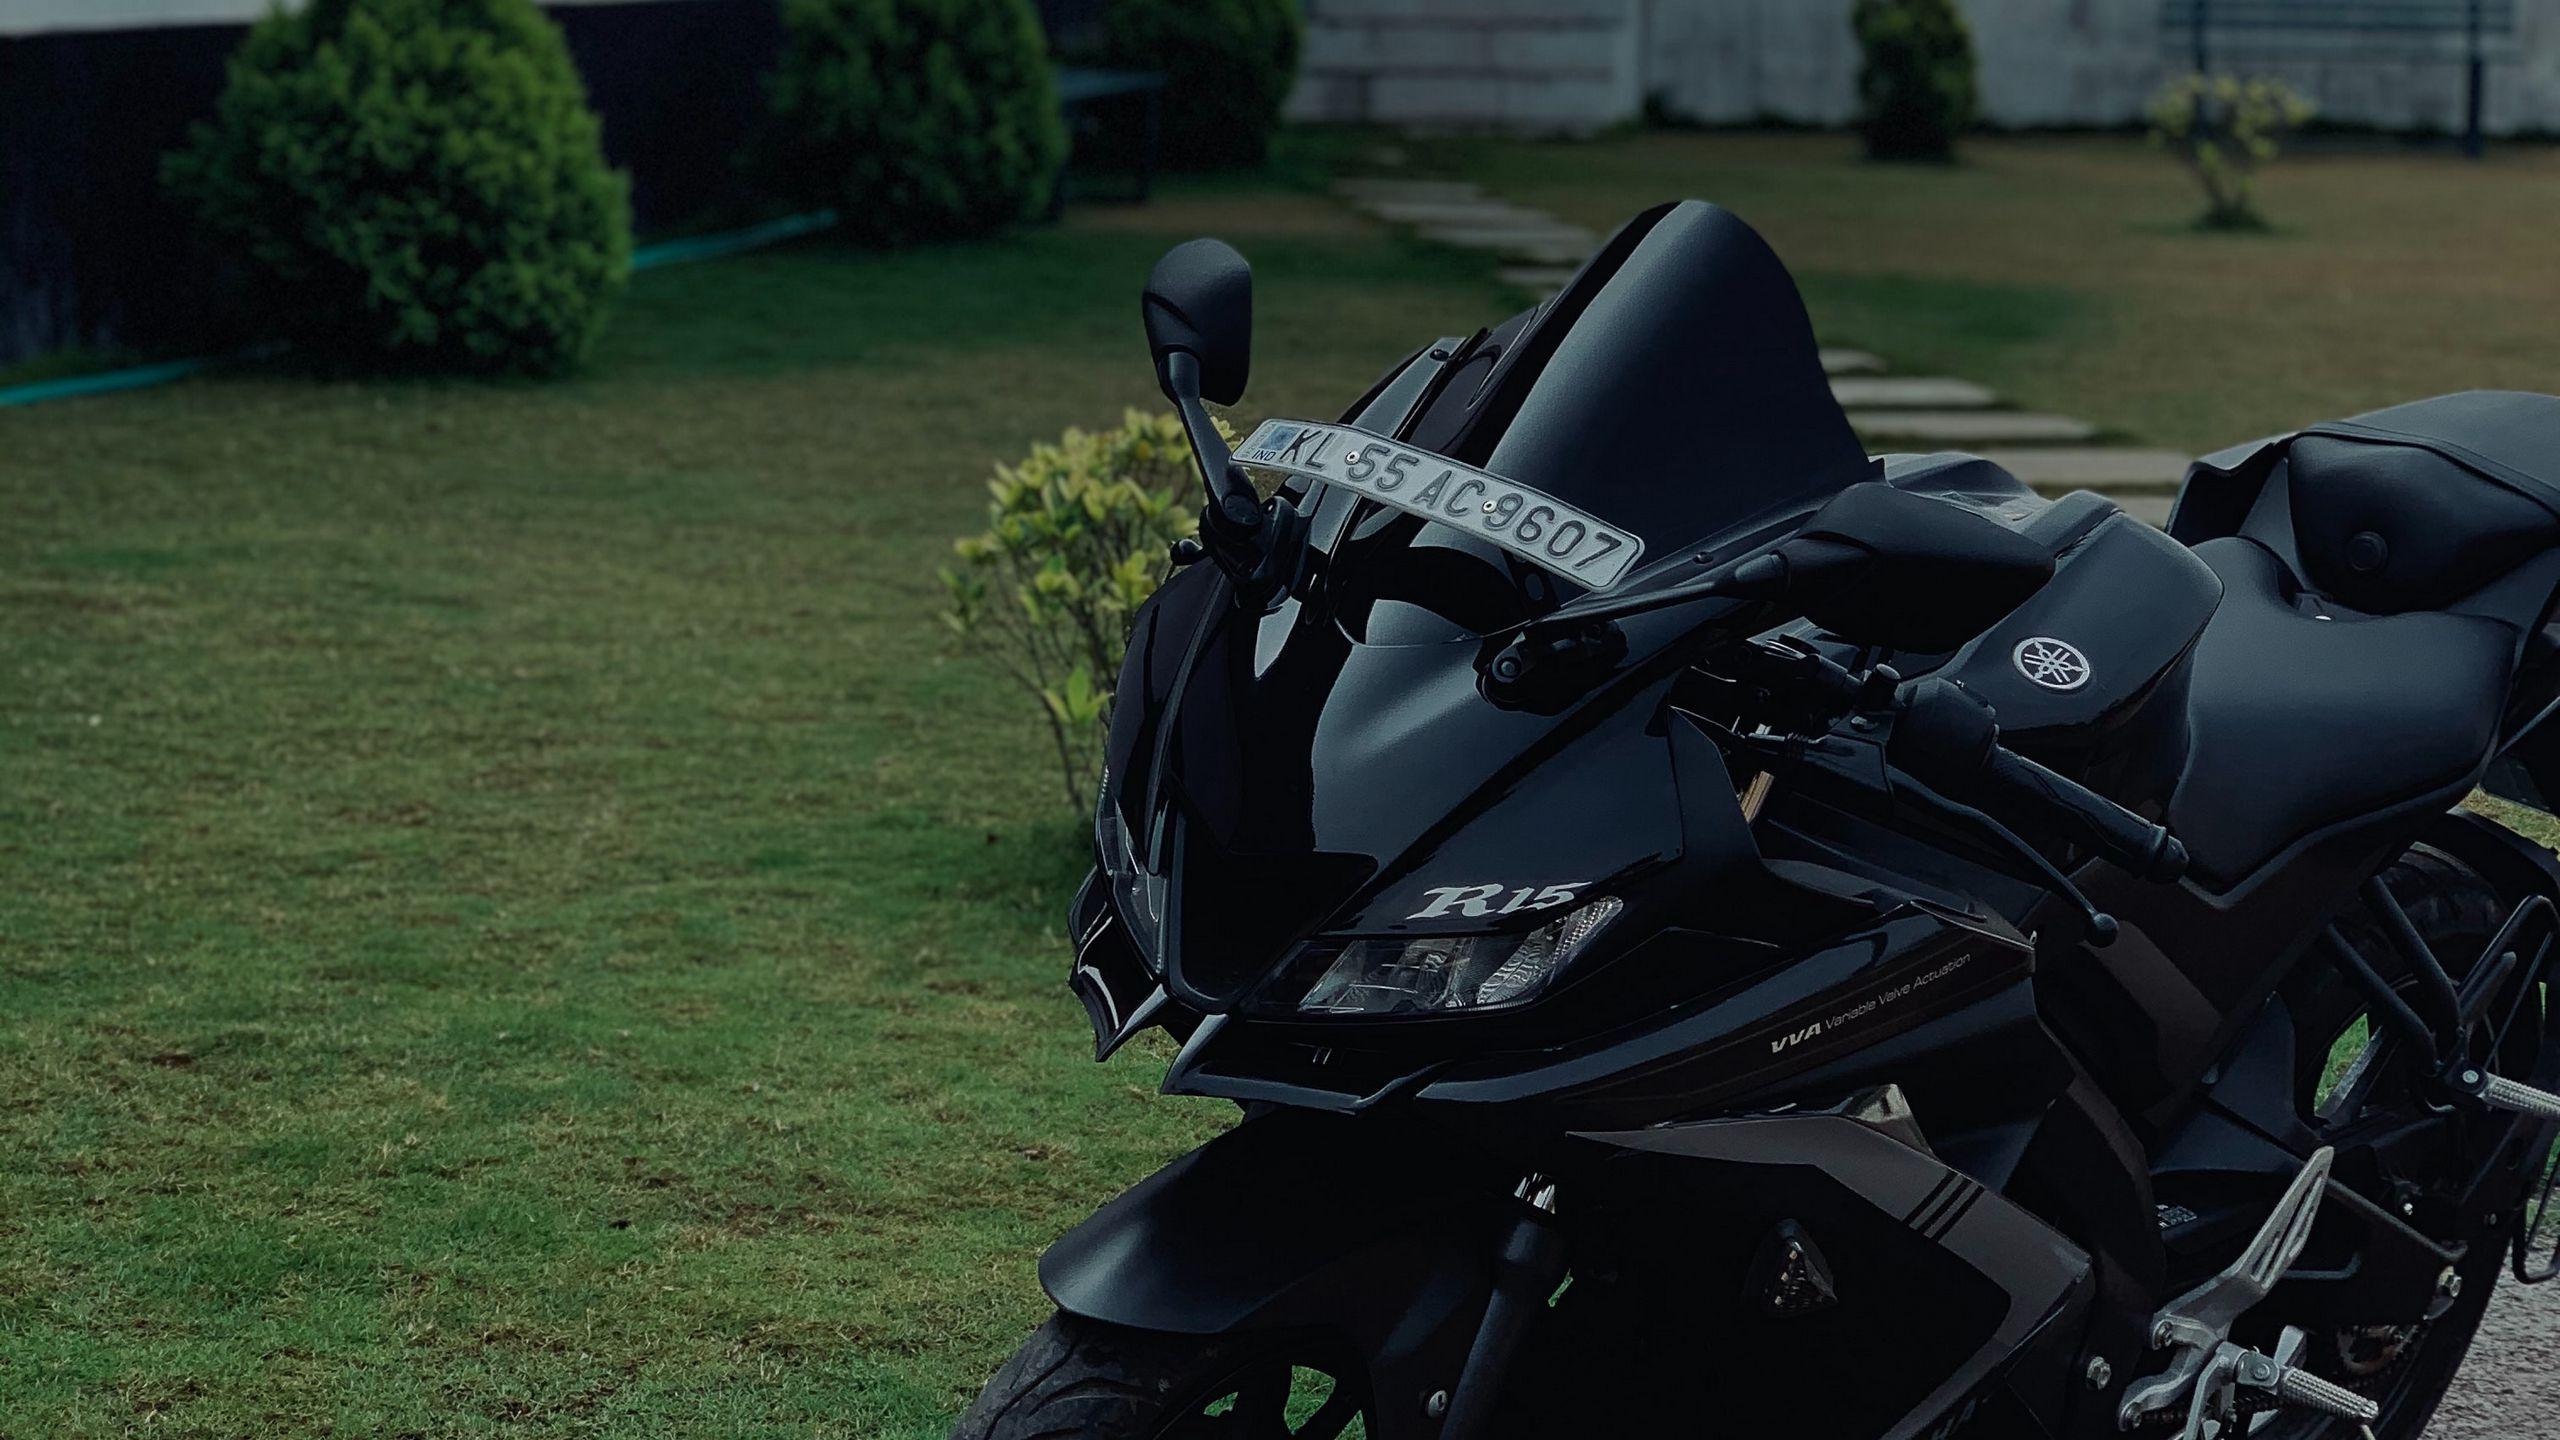 2560x1440 Wallpaper yamaha r15, yamaha, motorcycle, bike, black